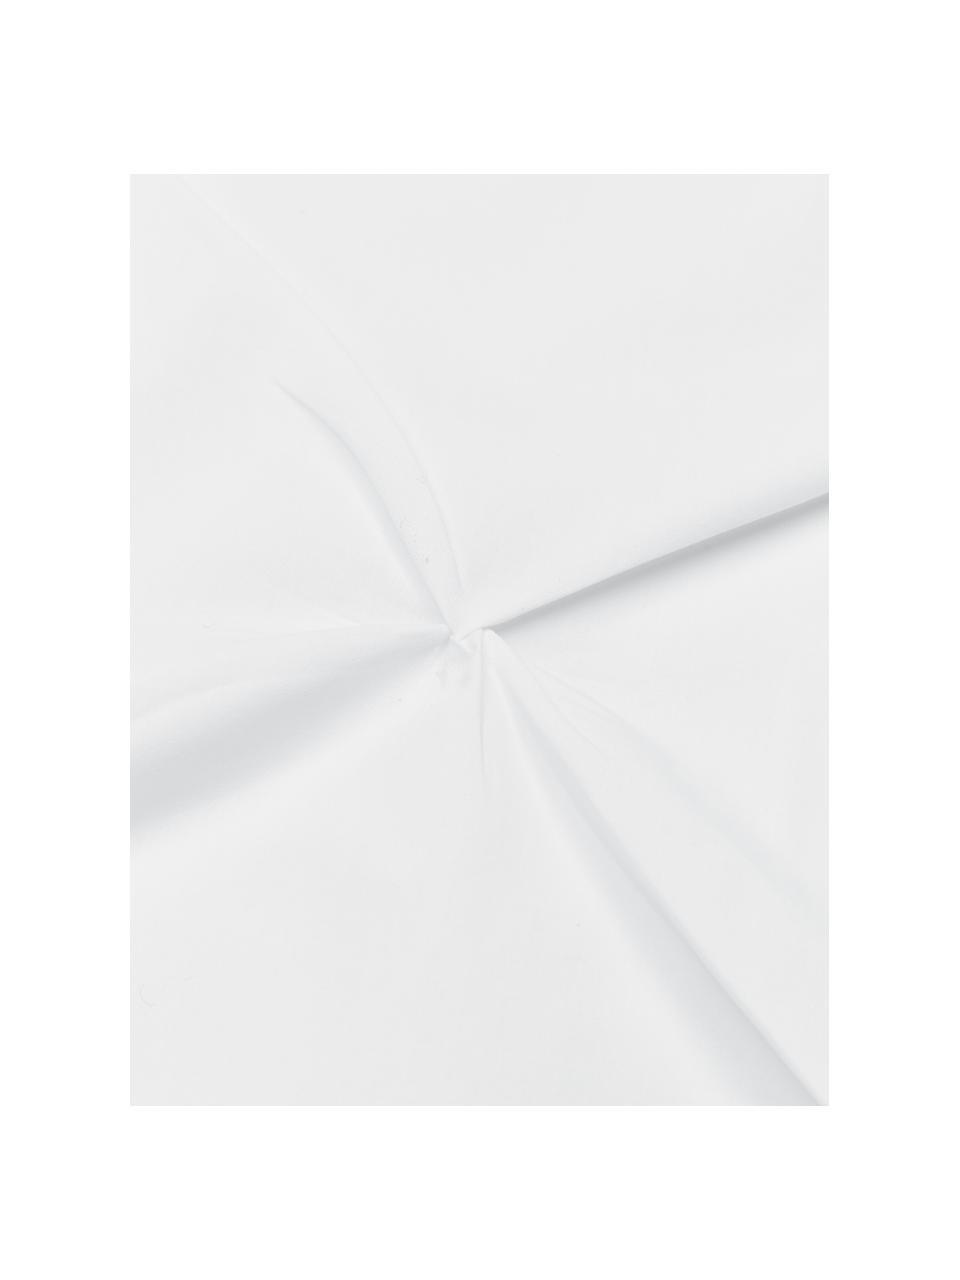 Baumwollperkal-Bettwäsche Brody mit Steppmuster in Origami-Optik, Webart: Perkal Fadendichte 200 TC, Weiß, 135 x 200 cm + 1 Kissen 80 x 80 cm